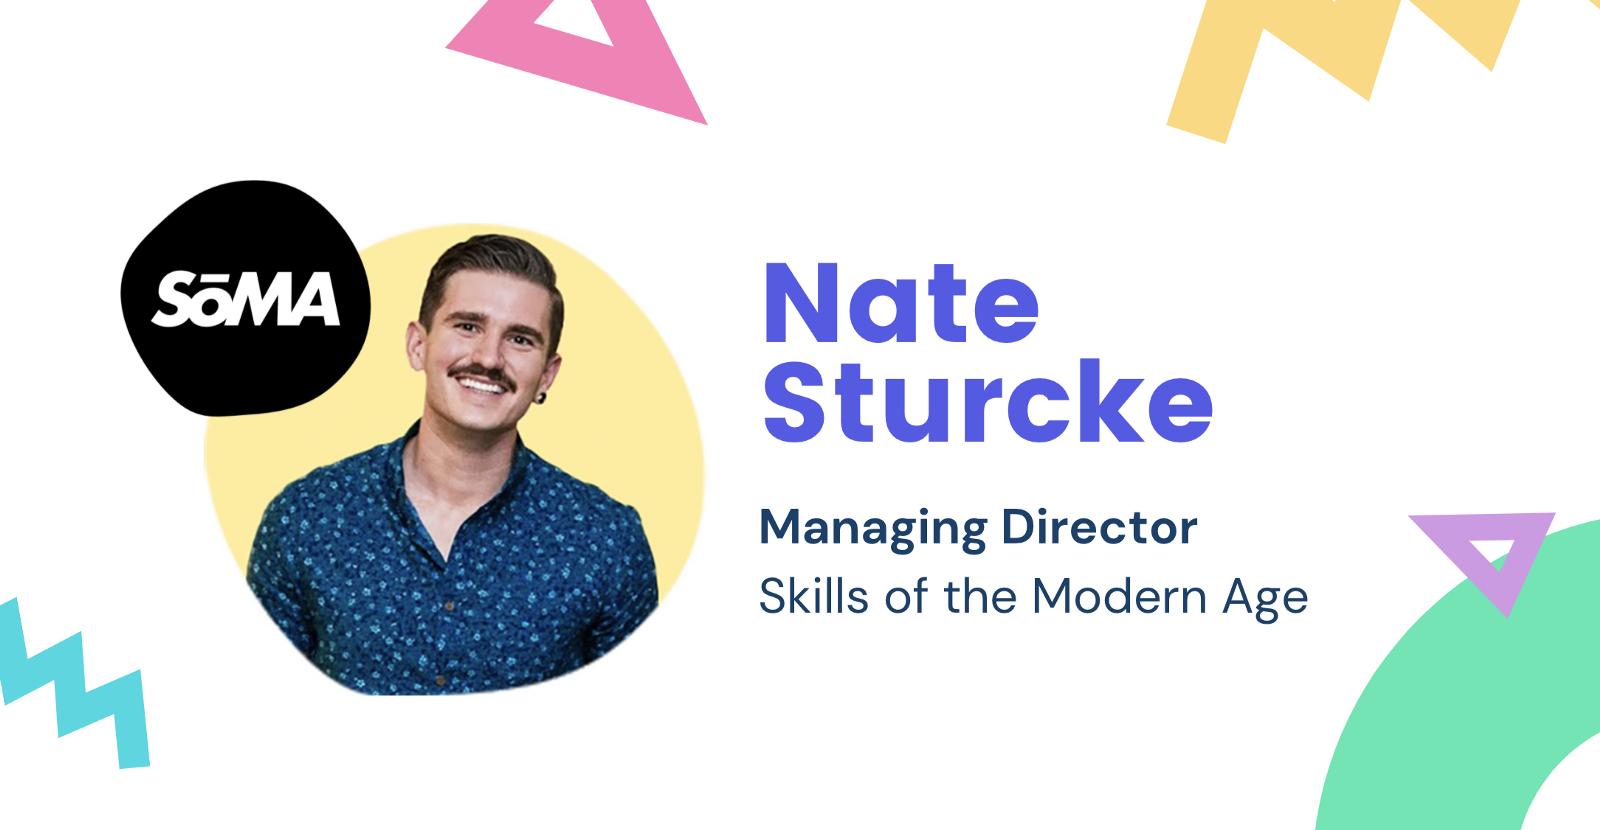 Nate Sturke Managing Director of Skills of the Modern Age